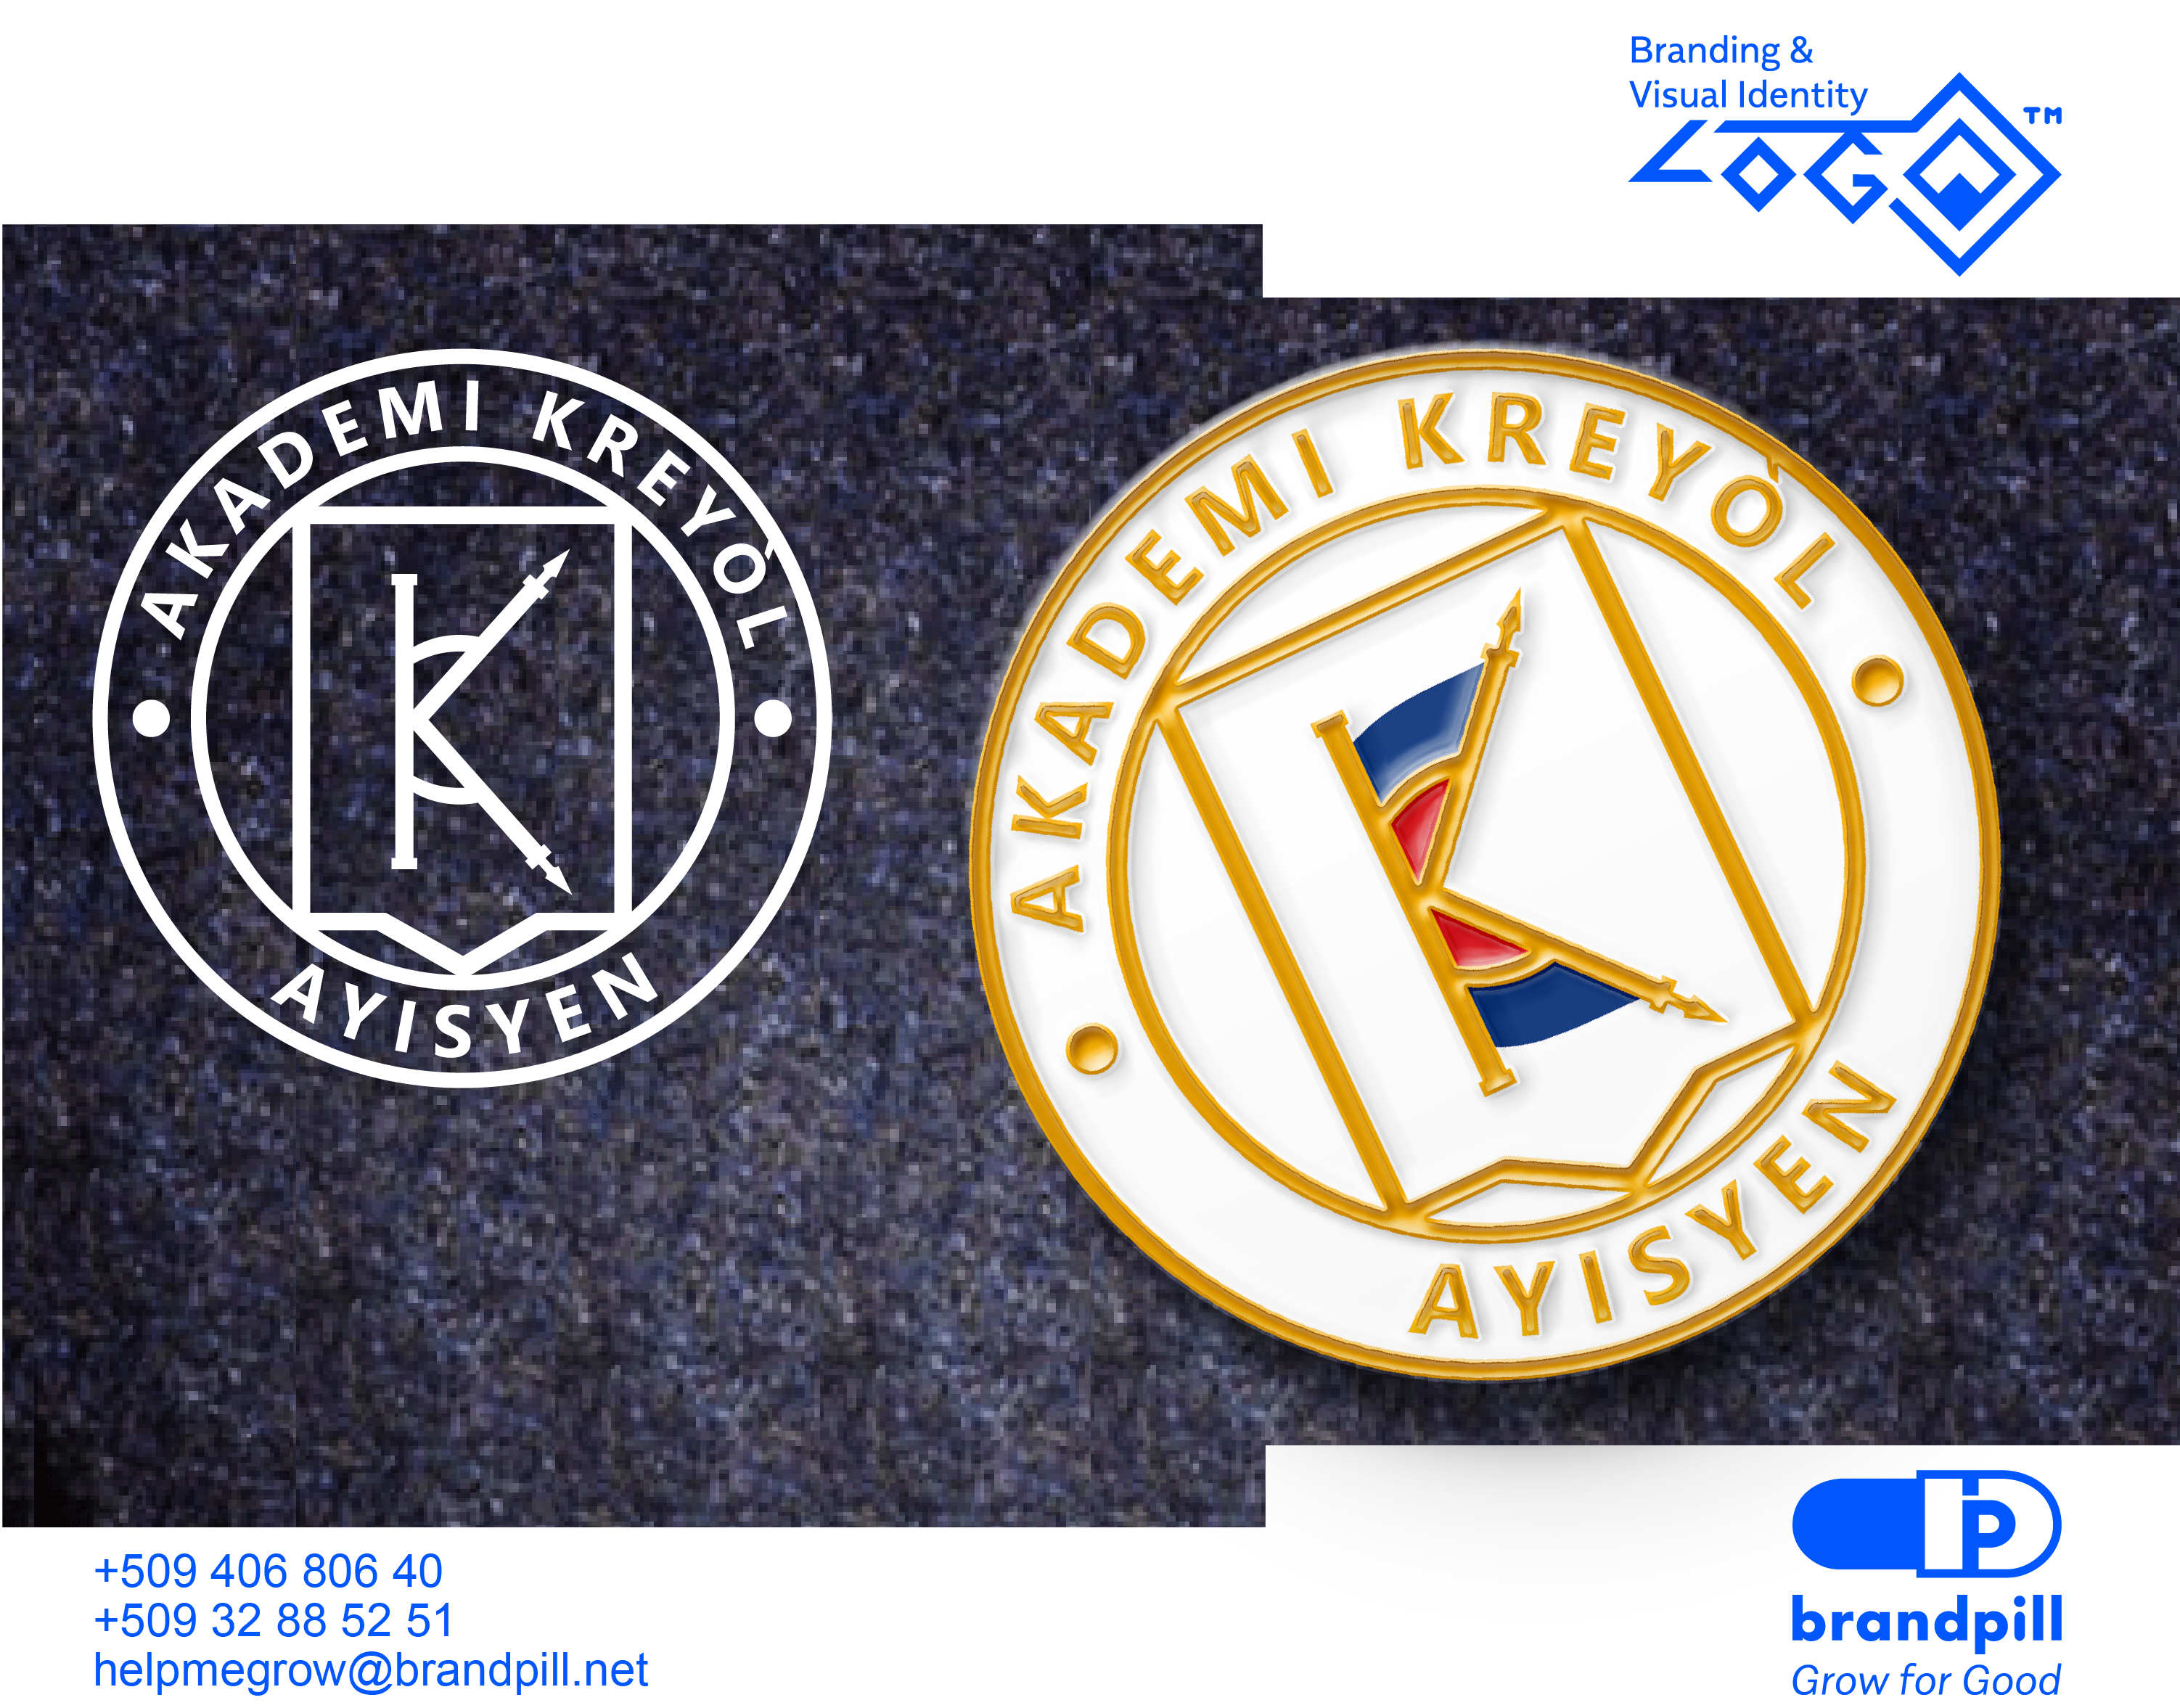 Akademi Kreyol Ayisyen Branding by brandpill